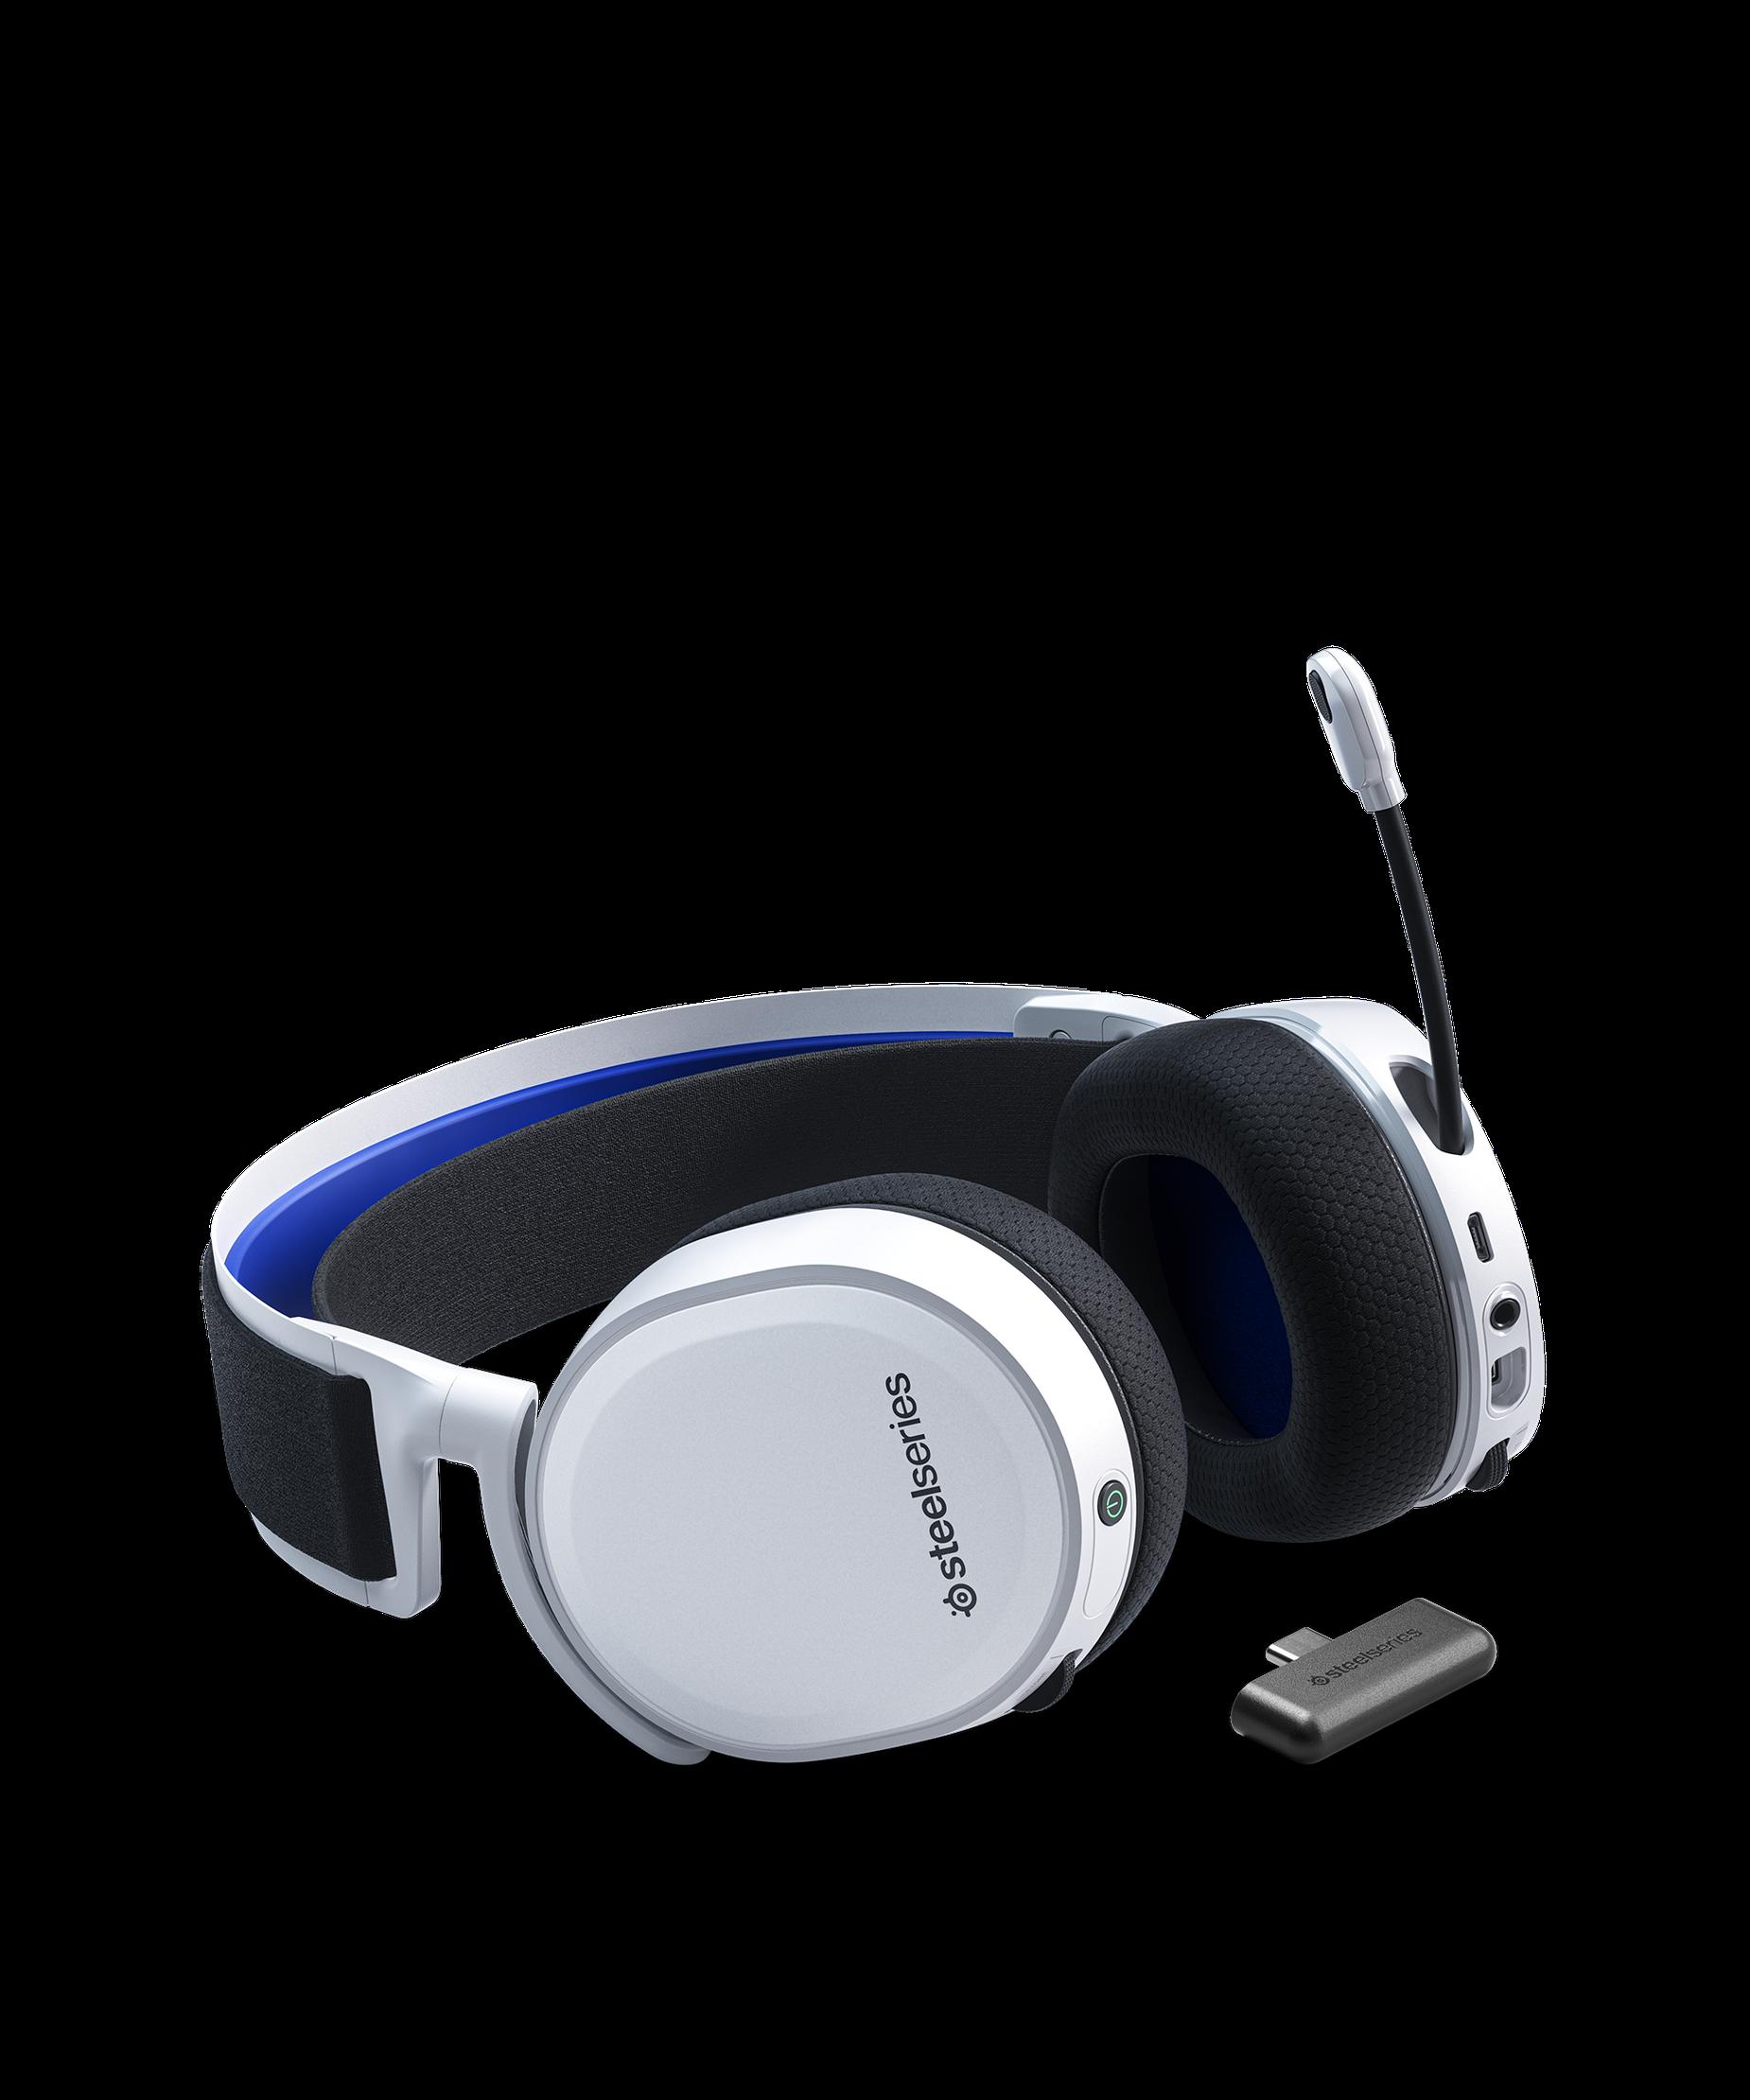 Arctis 7P耳機平放且 clearcast 麥克風呈現打開的位置